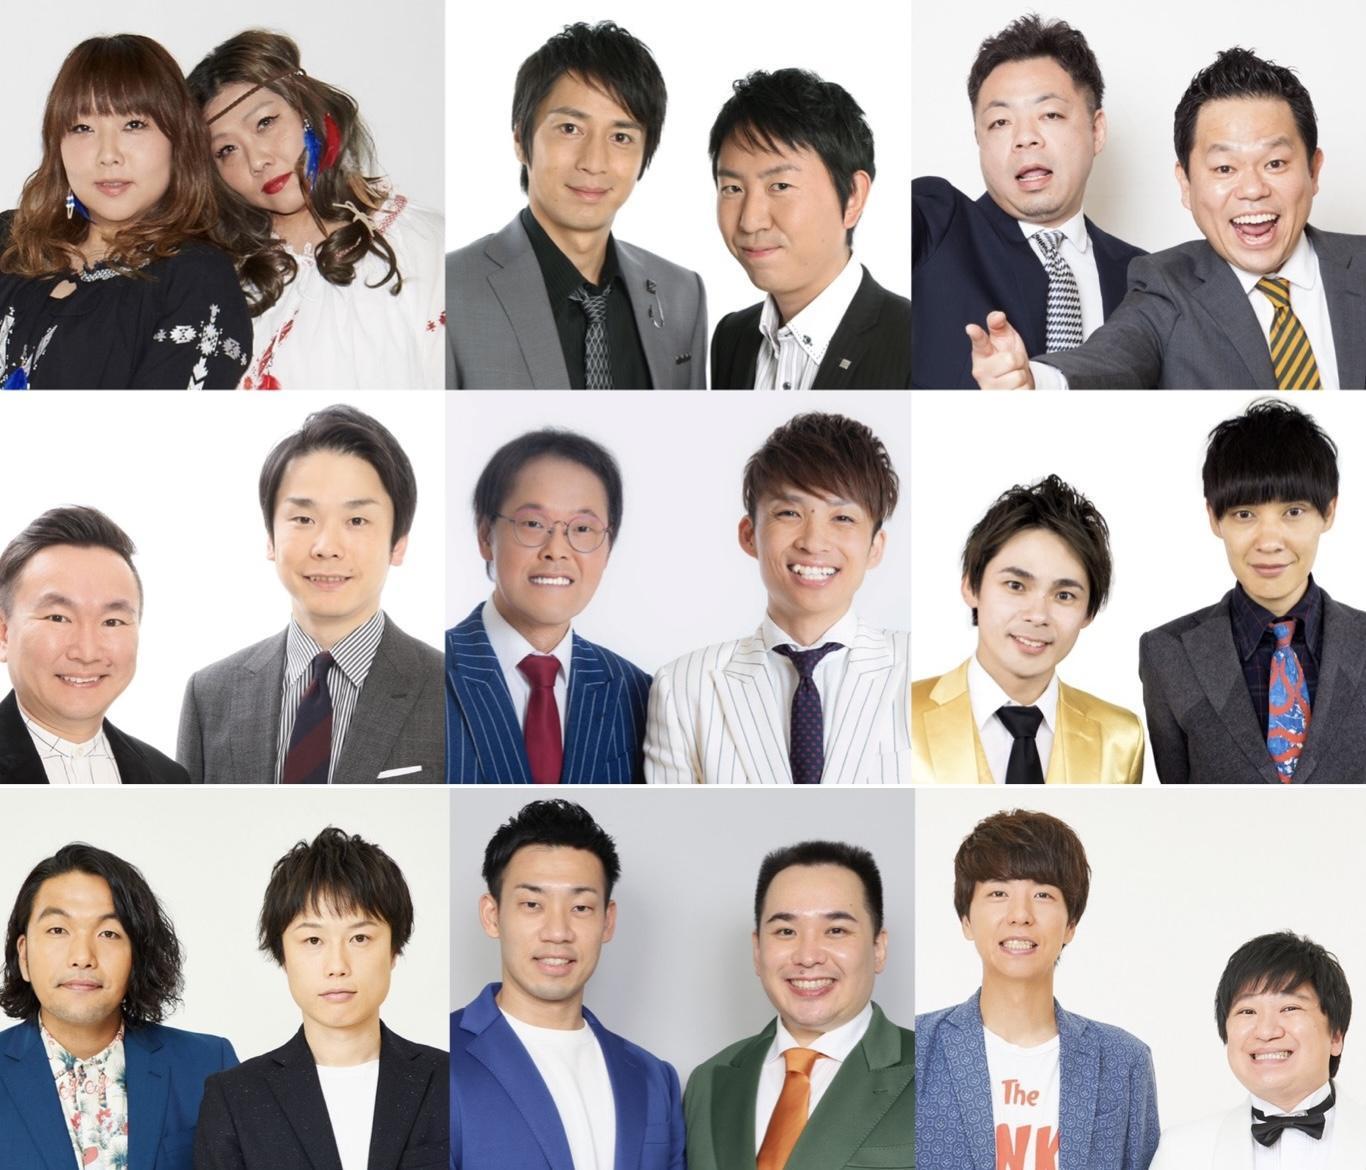 http://www.syumatsu.jp/20210415135227-3727be5b816d092b6120d09d1fdadae3106ff651.jpg